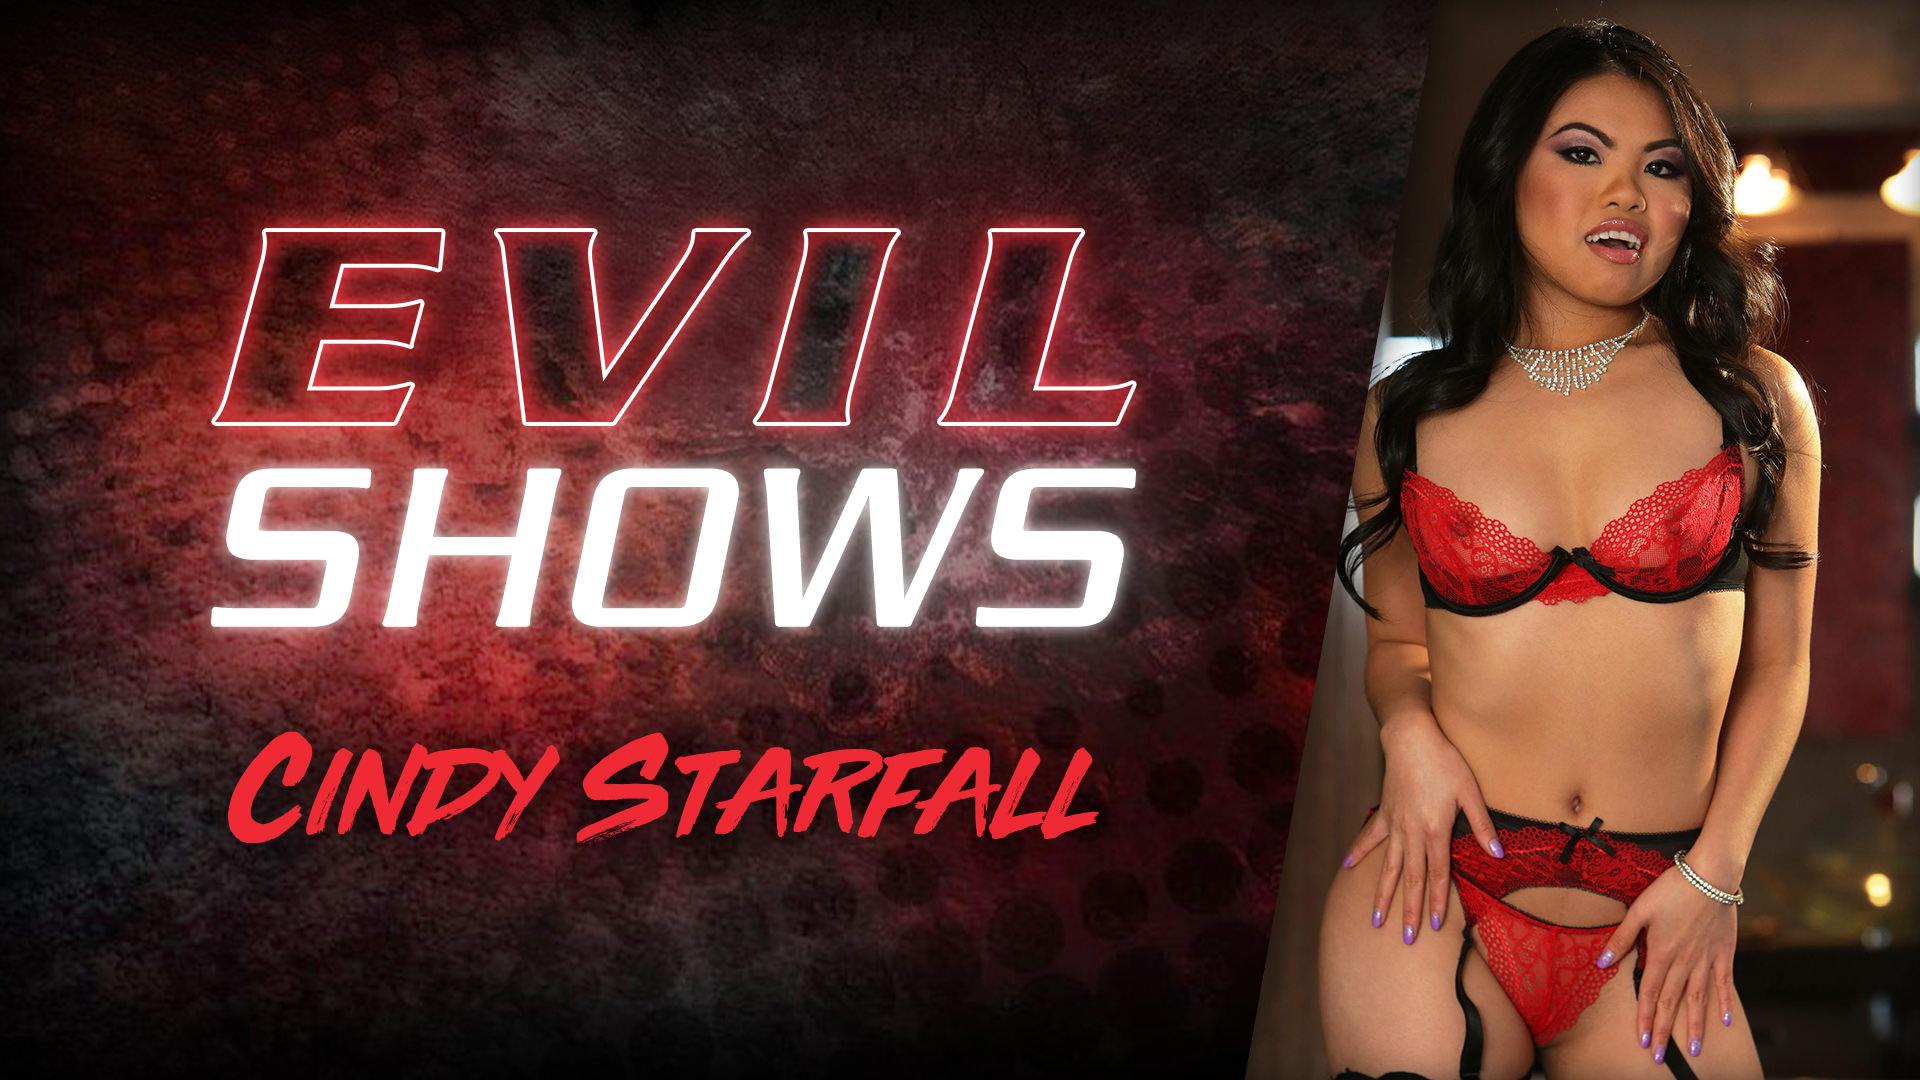 Evil Shows - Cindy Starfall - Cindy Starfall 1